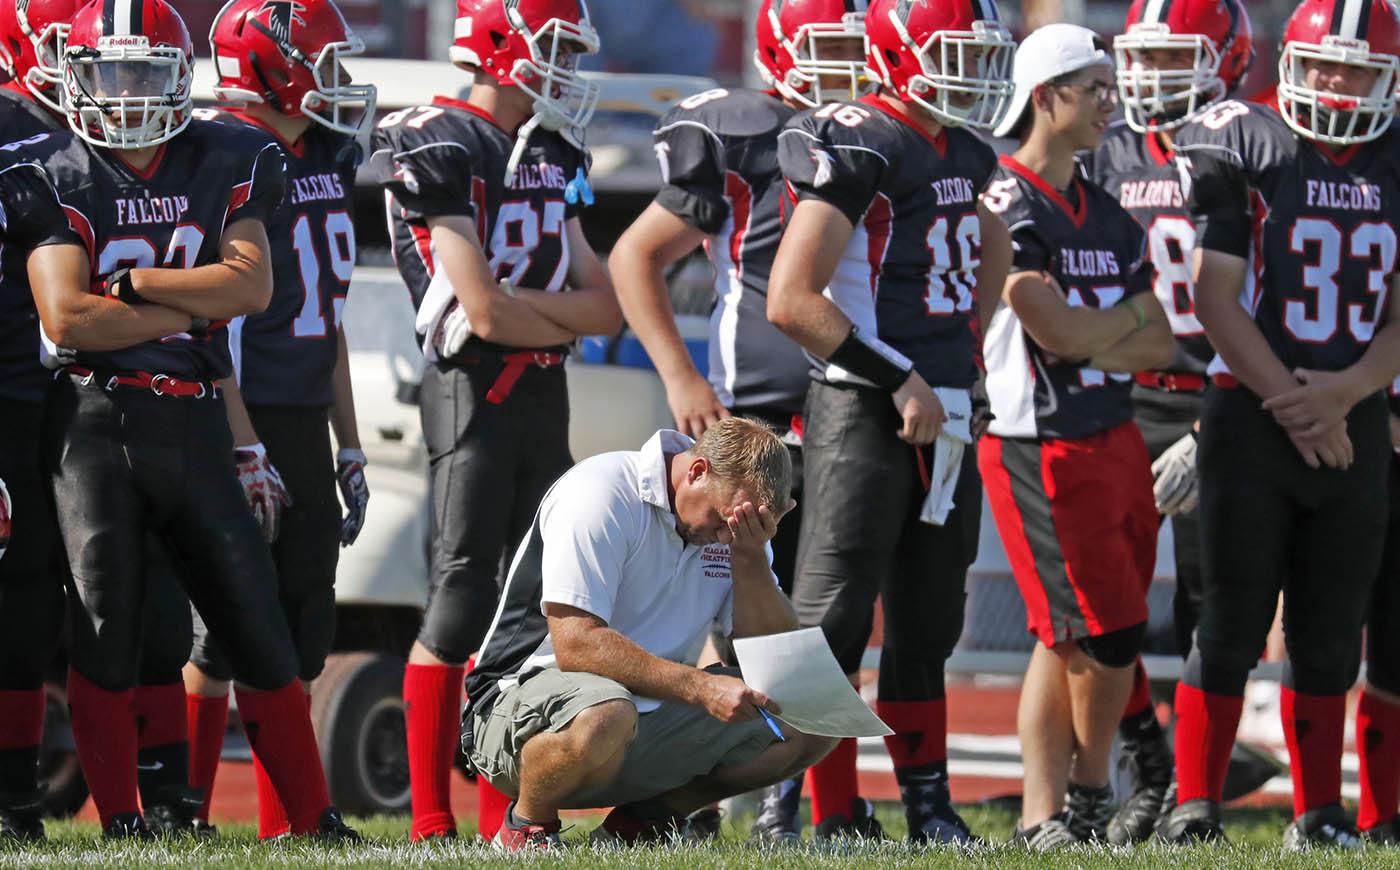 Niagara Wheatfield coach Brent Tylec during second half action against Grand Island at Niagara Wheatfield high school on Saturday, Sept. 3, 2016. (Harry Scull Jr./Buffalo News)